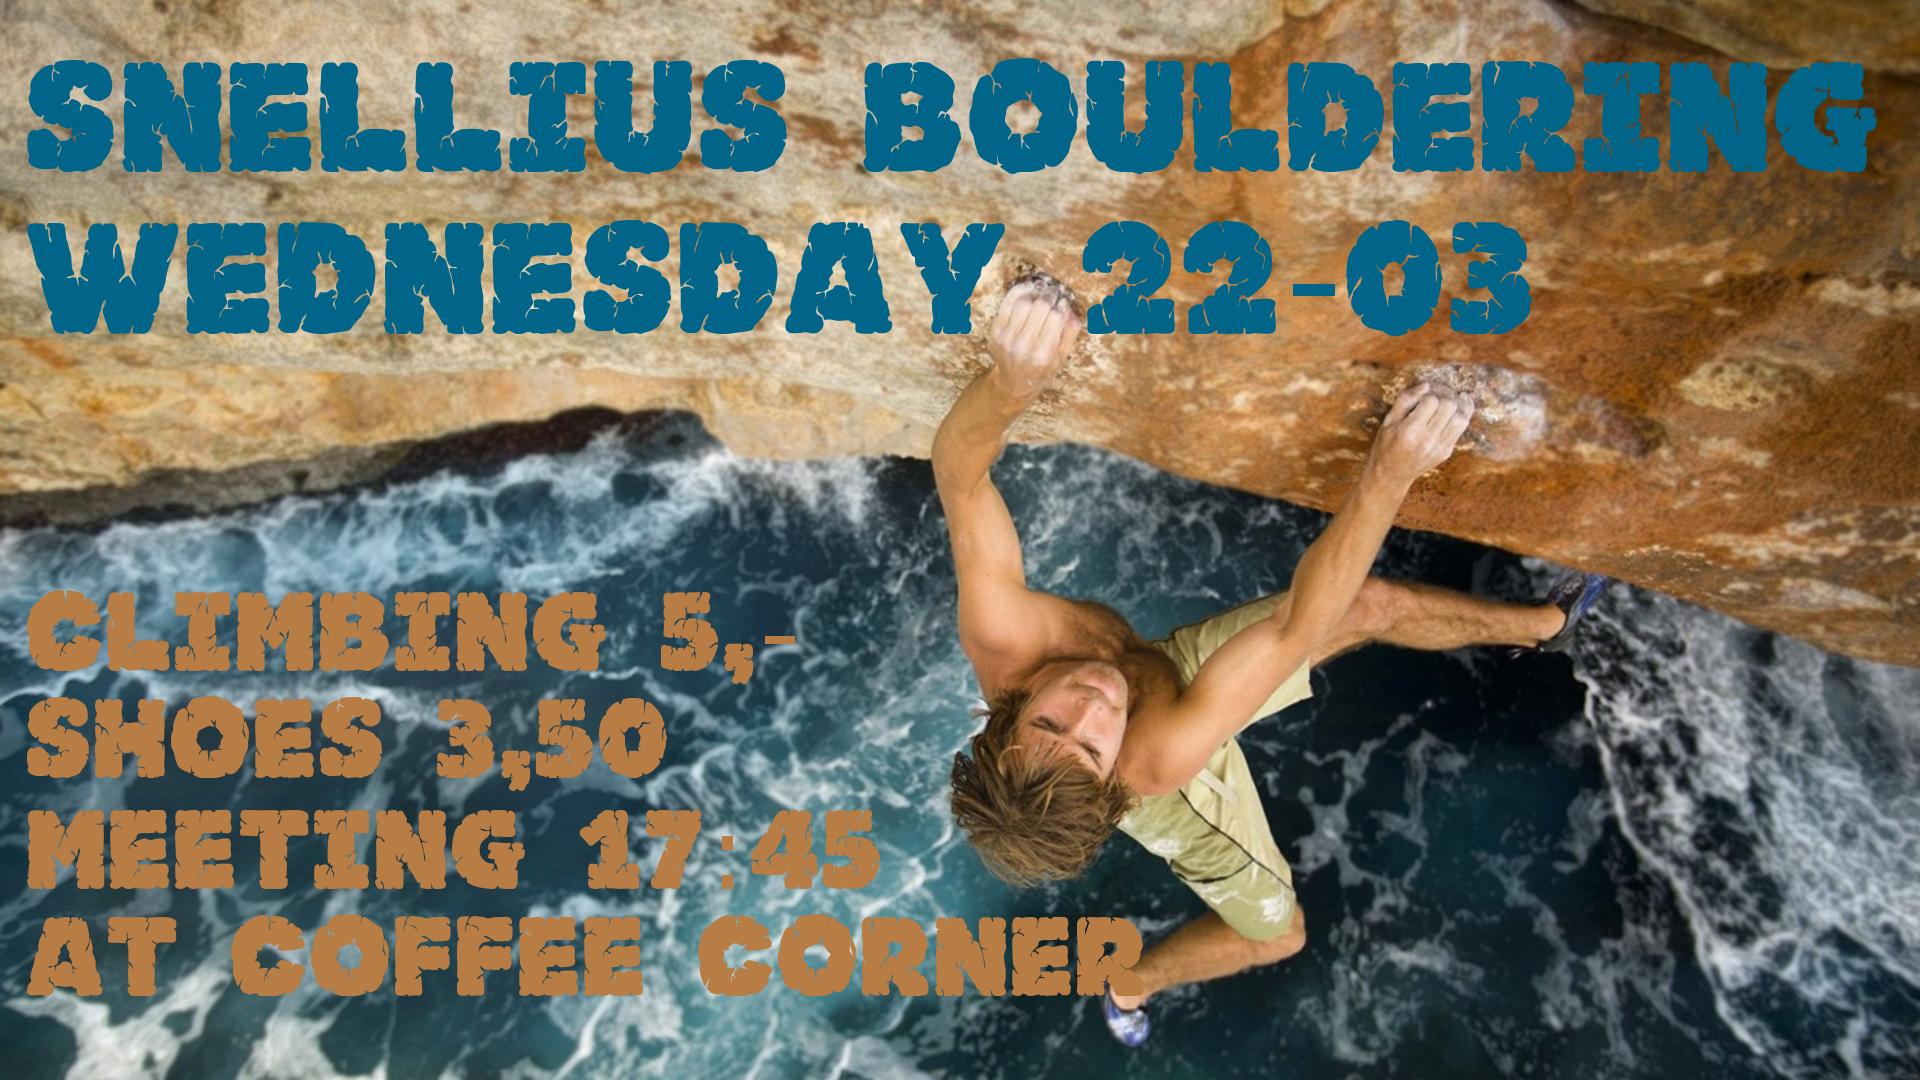 http://snelliusdispuut.nl/wp-content/uploads/2016/08/bouldering_snellius.png